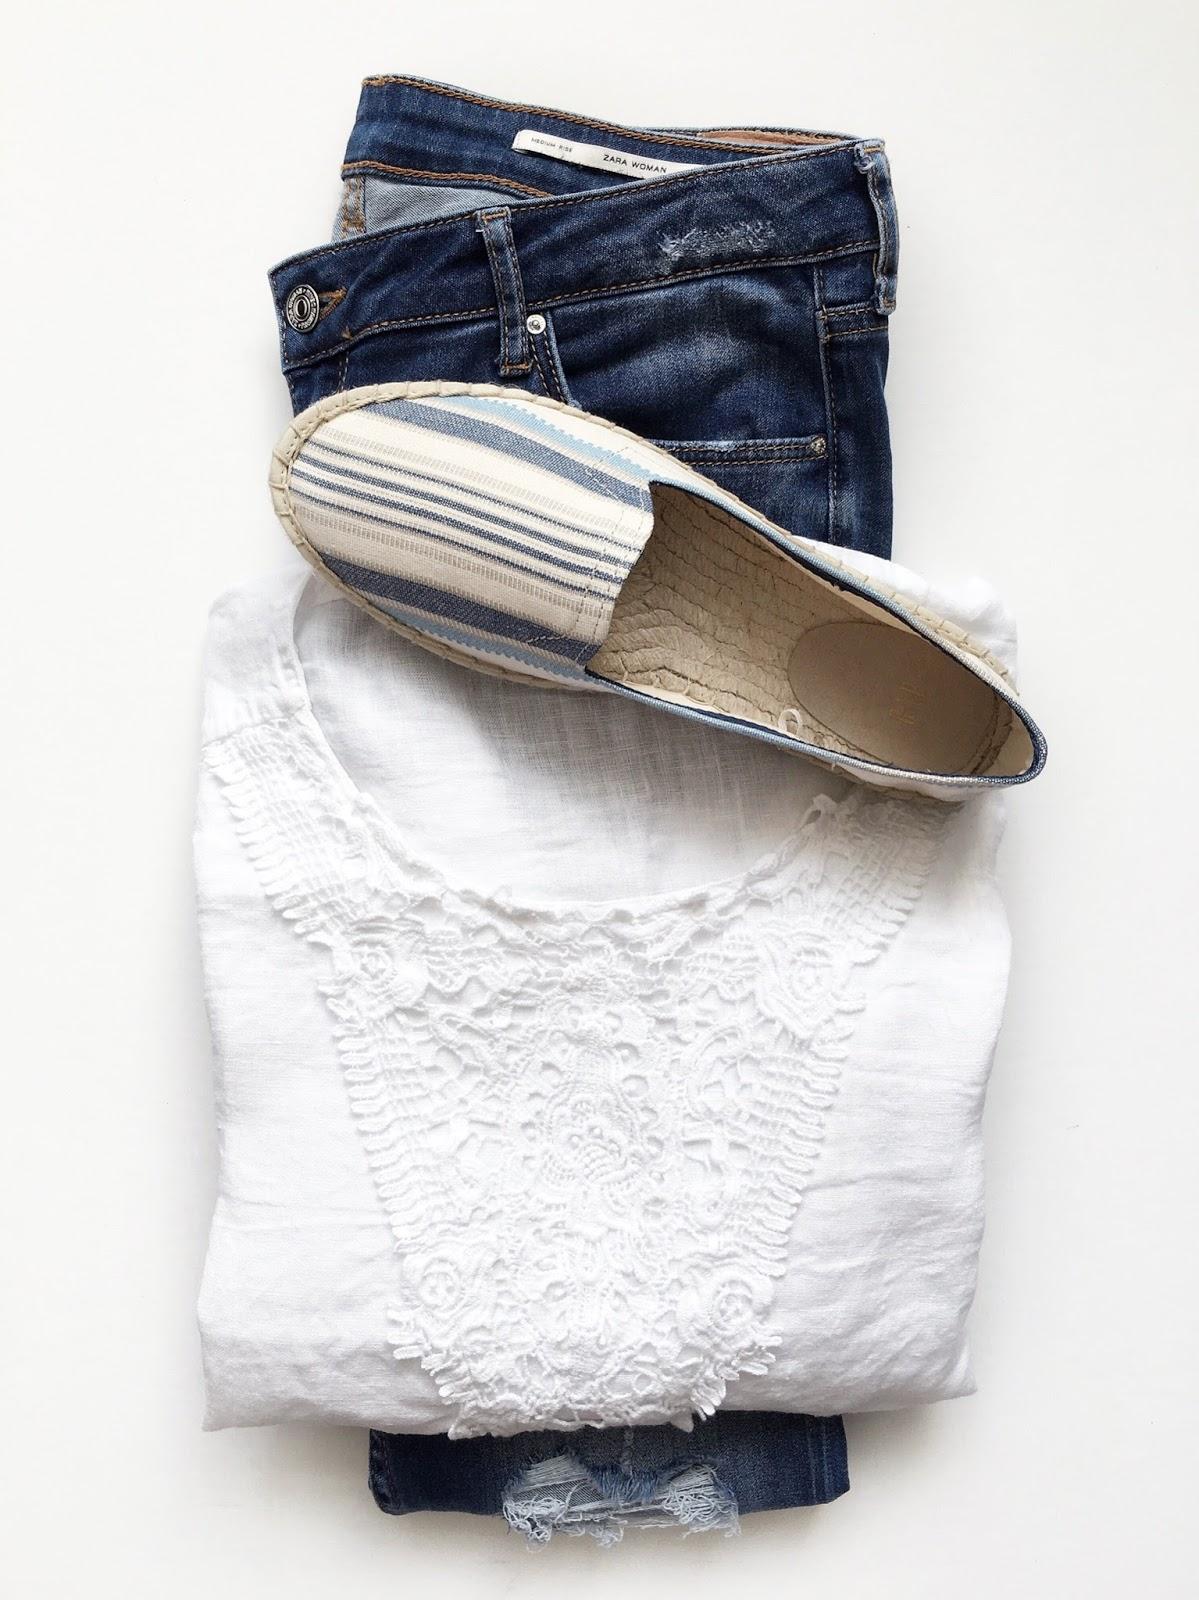 Striped Gap espadrilles, Zara linen top and Zara distressed skinny jeans